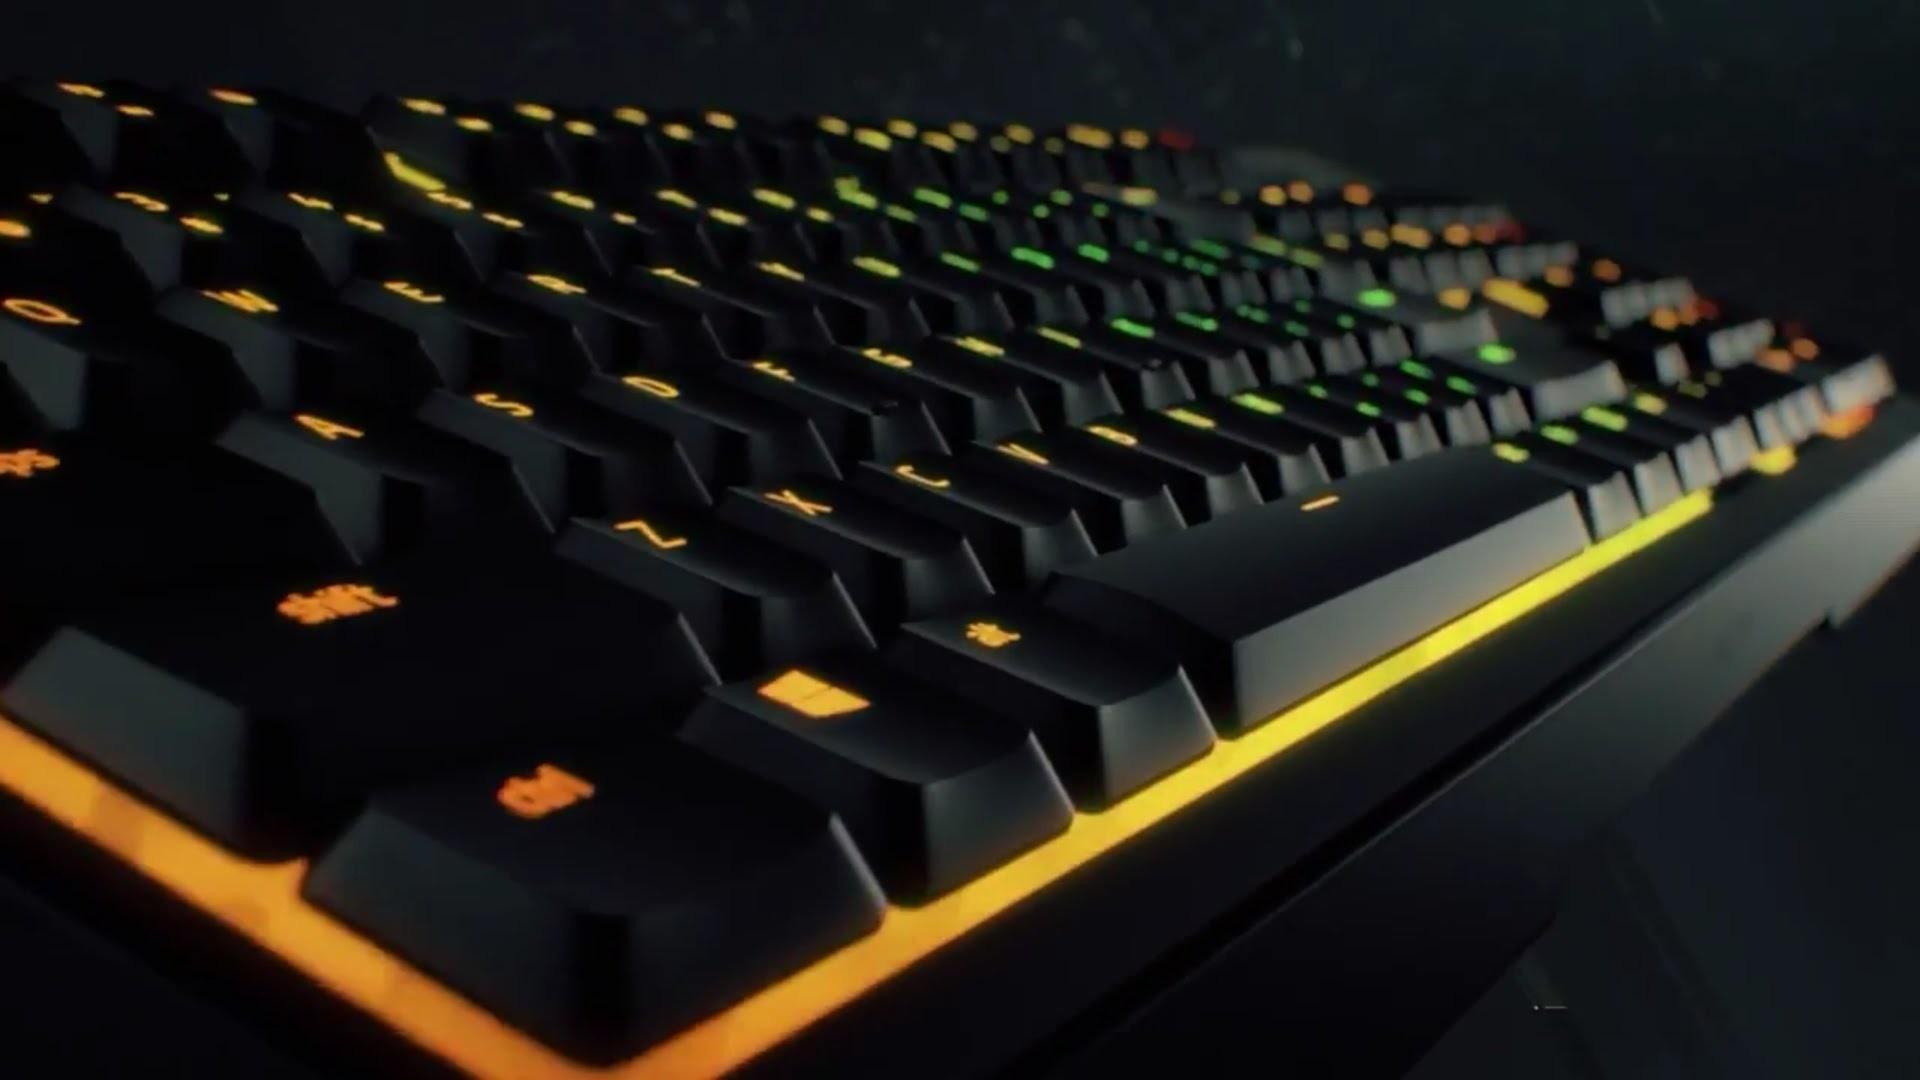 Keyboard wallpaper photo hd